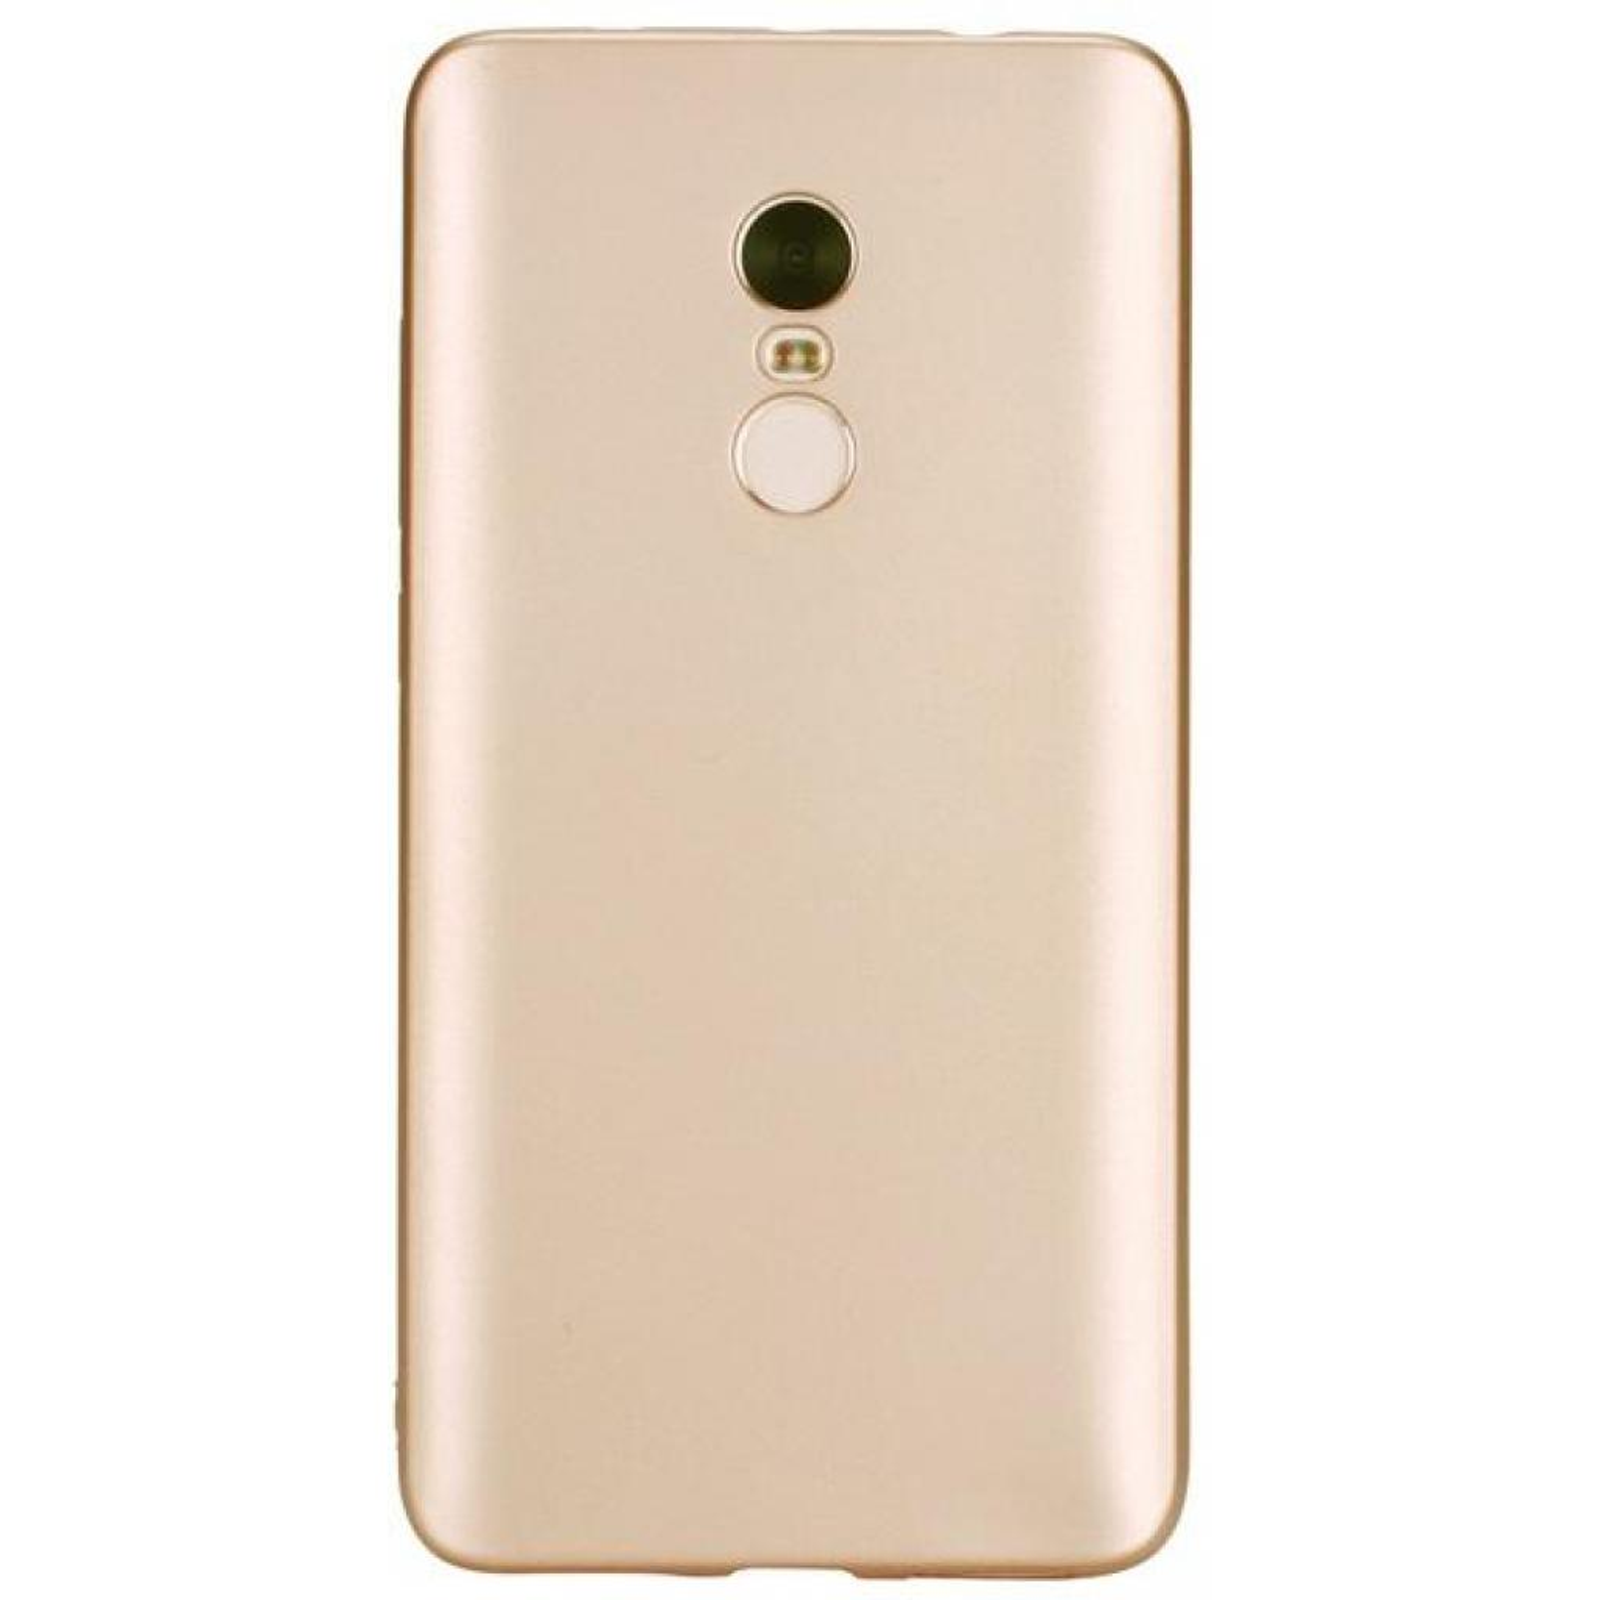 Чехол для моб. телефона T-Phox для XIAOMI REDMI NOTE 4 - SHINY (GOLD) (6361816)